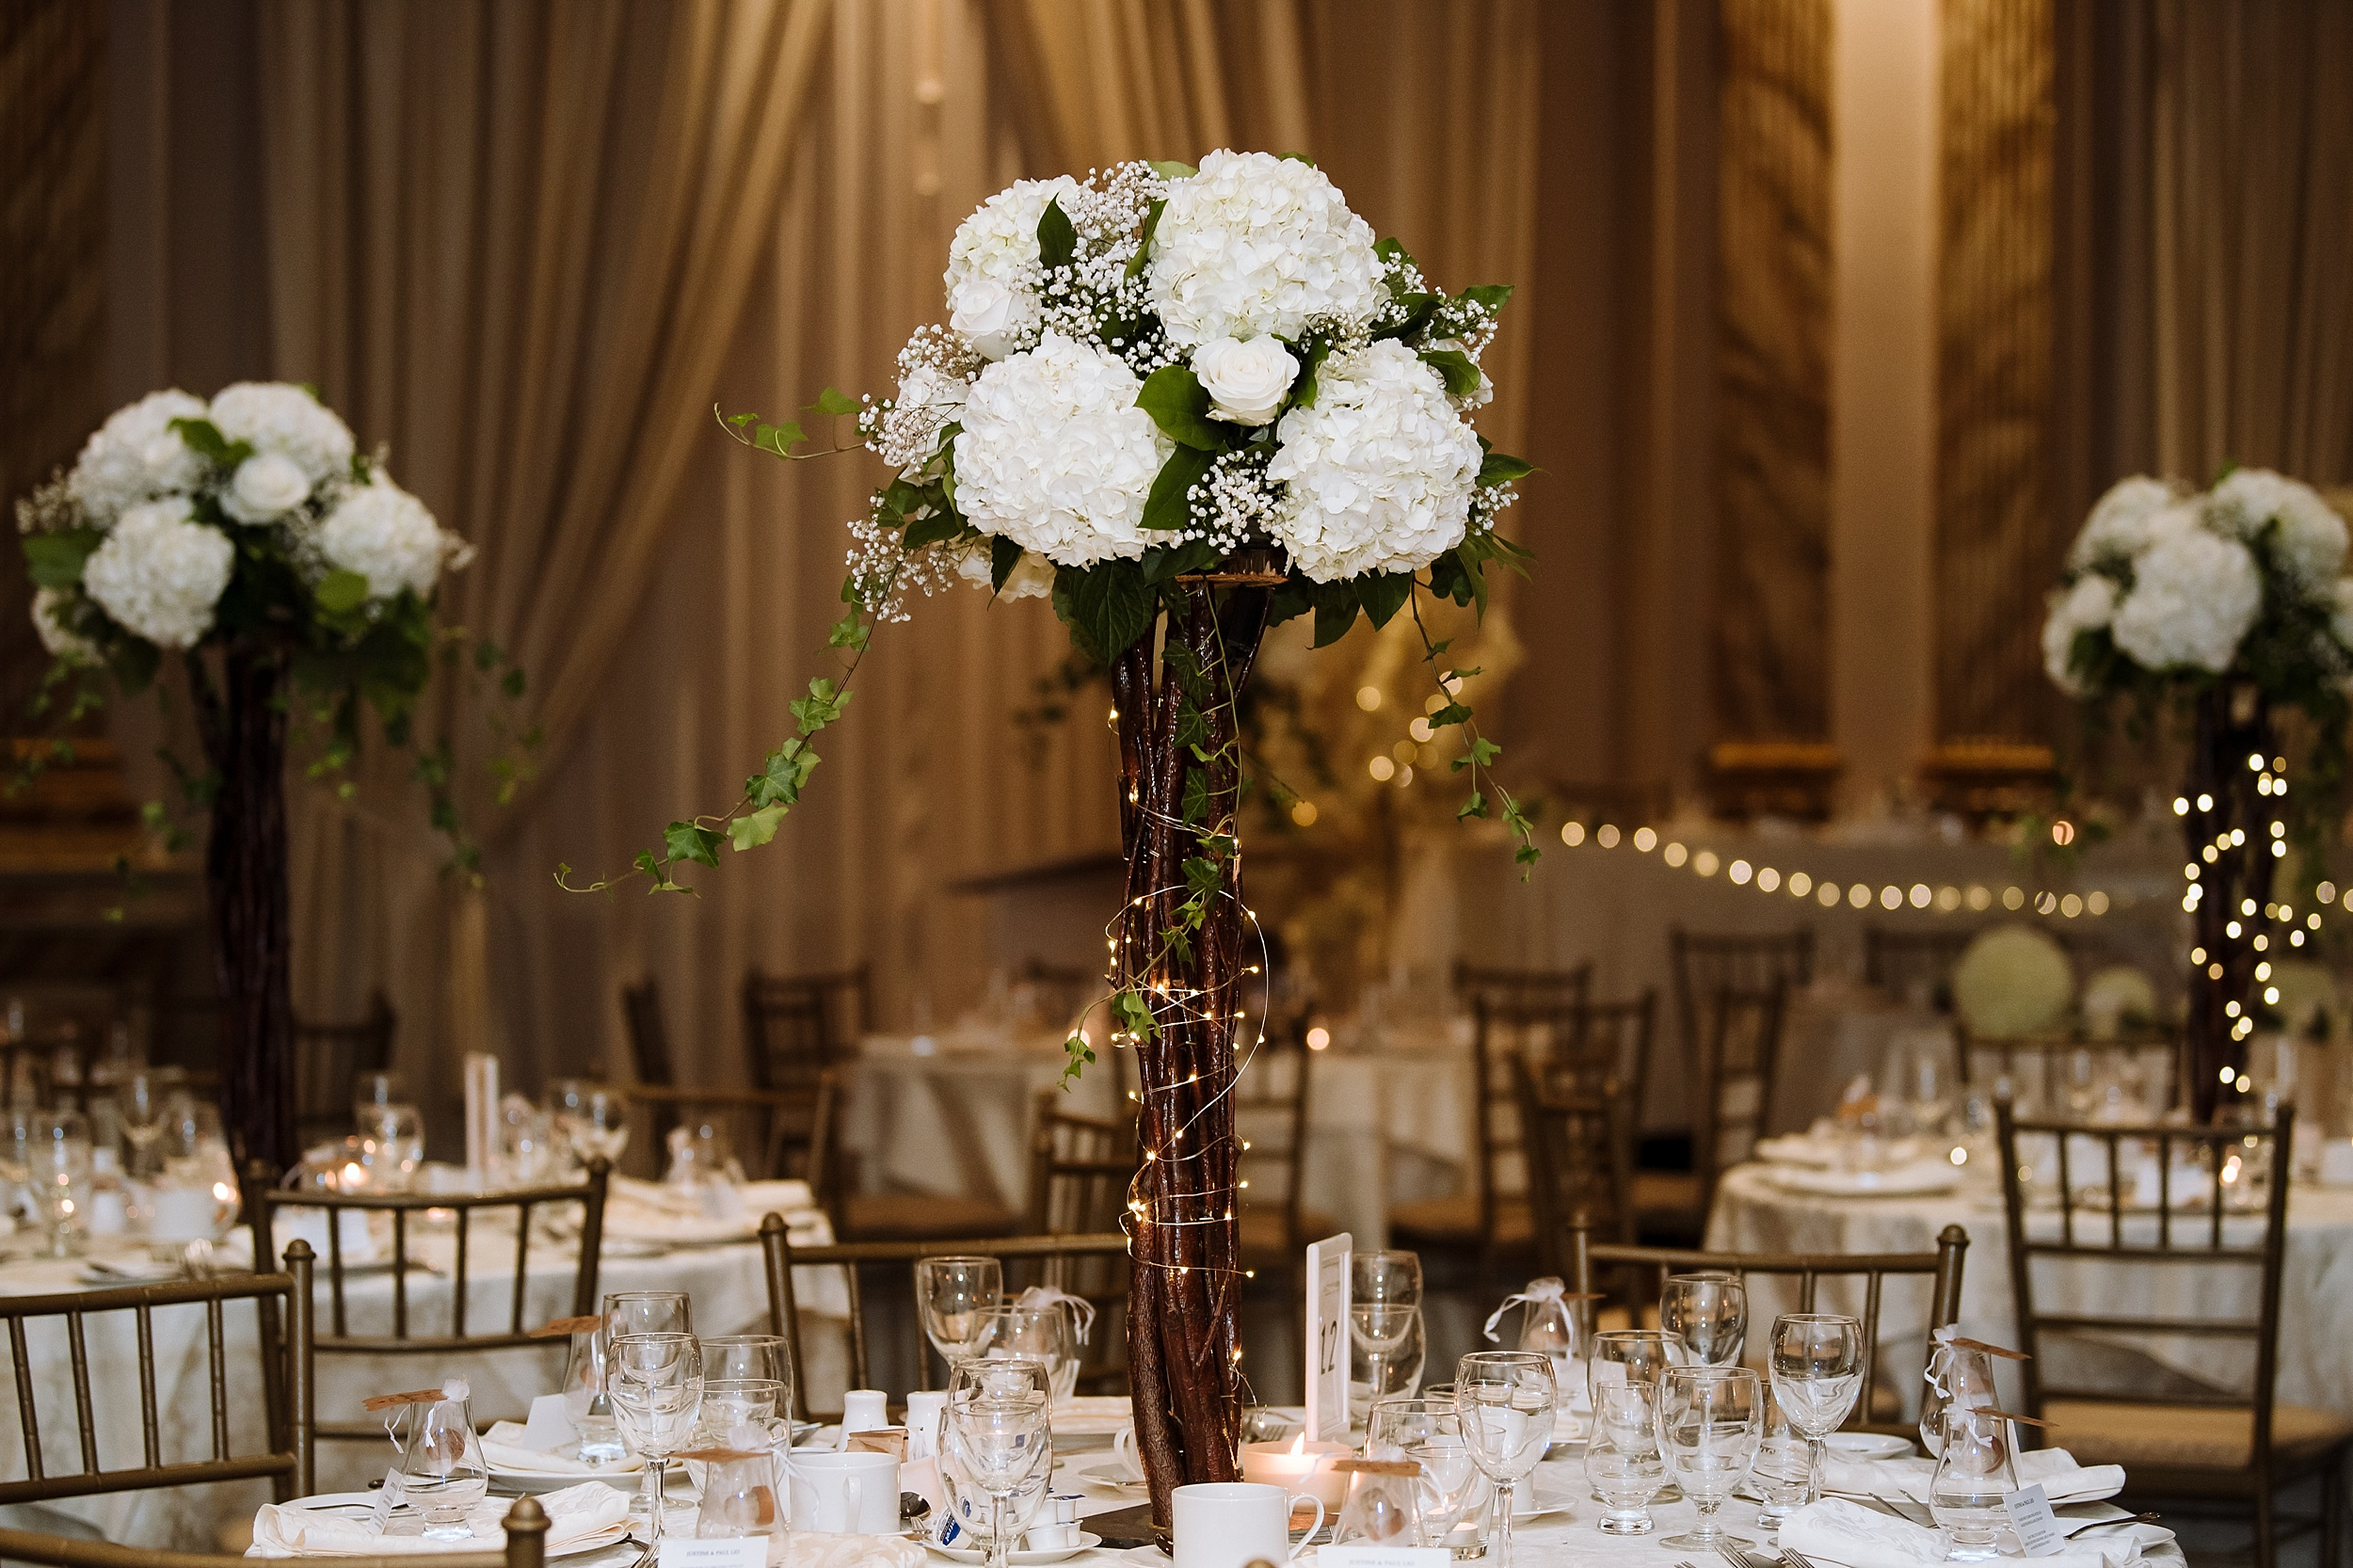 McMichael_Art_Collection_Wedding_chateau_le_jardin_Justine_Munro_Toronto_Photographer062.jpg